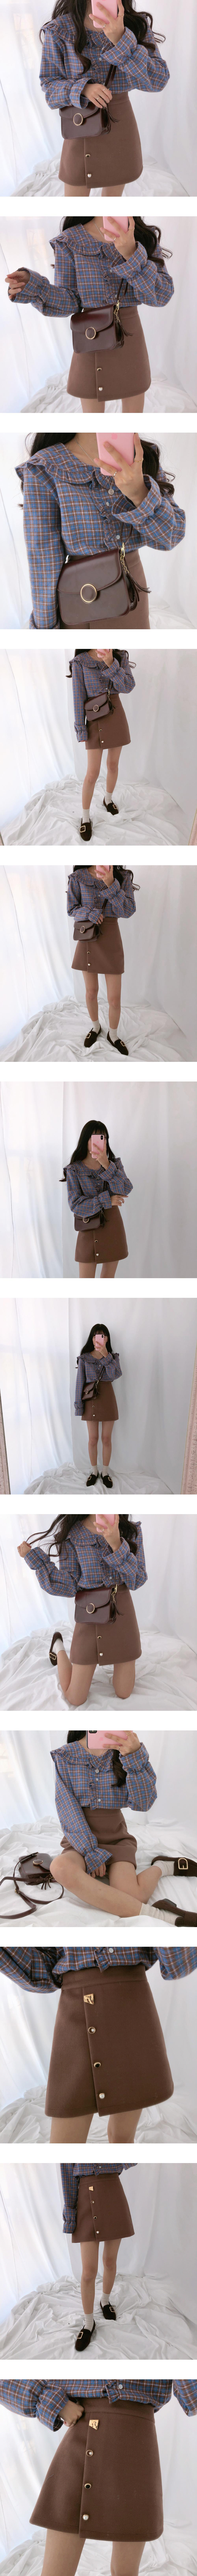 Cubic wrap skirt